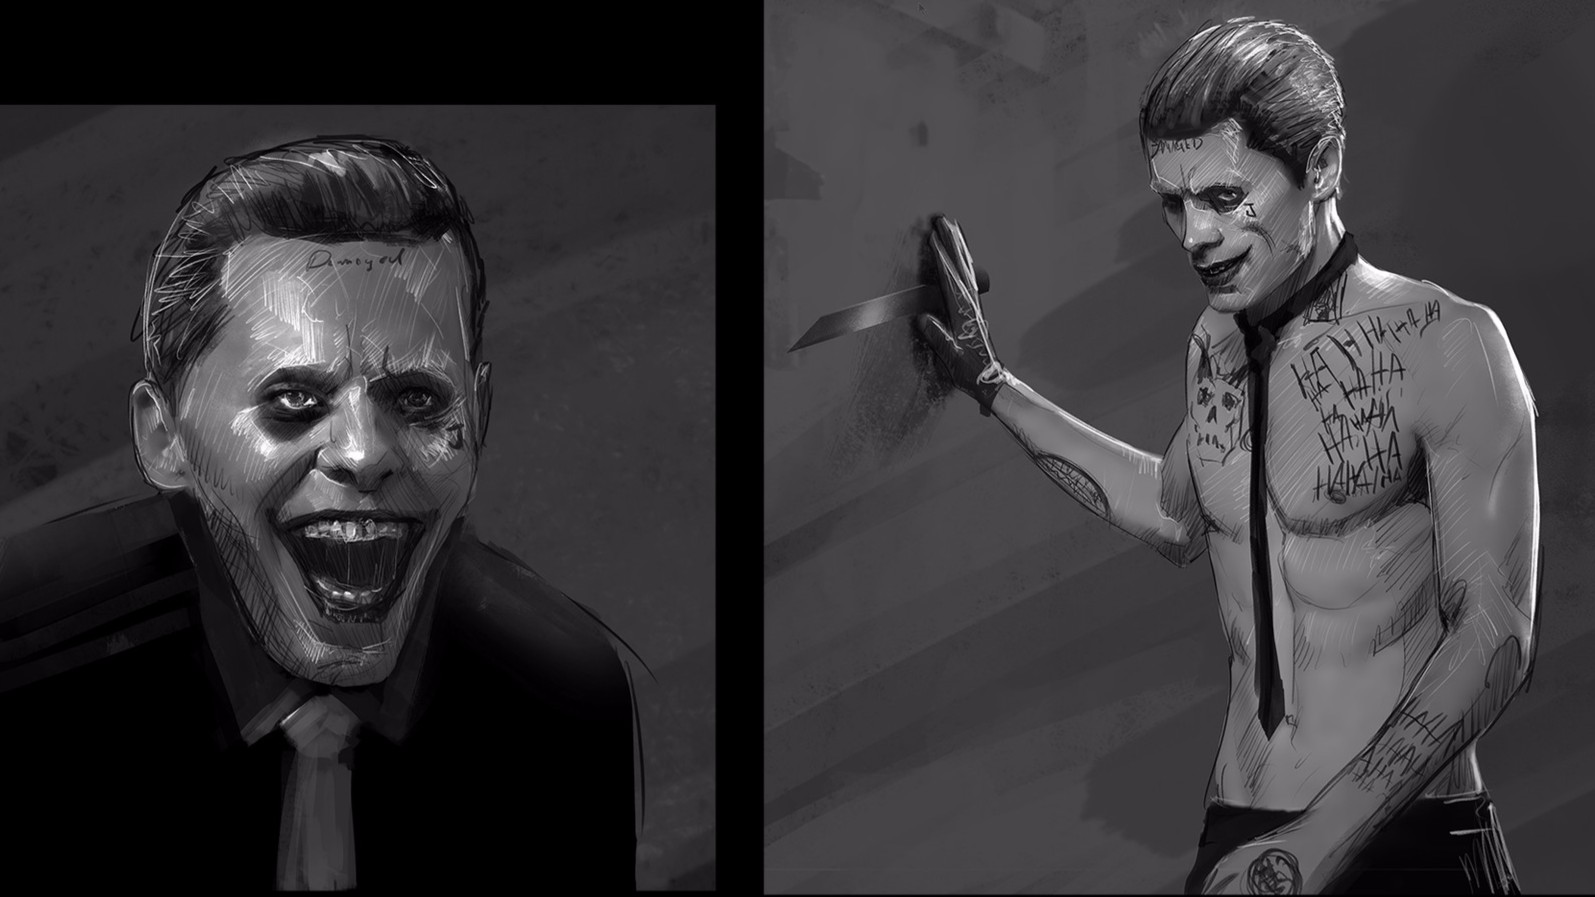 andrew-hunt-suicide-squad-joker-sketches-Edited